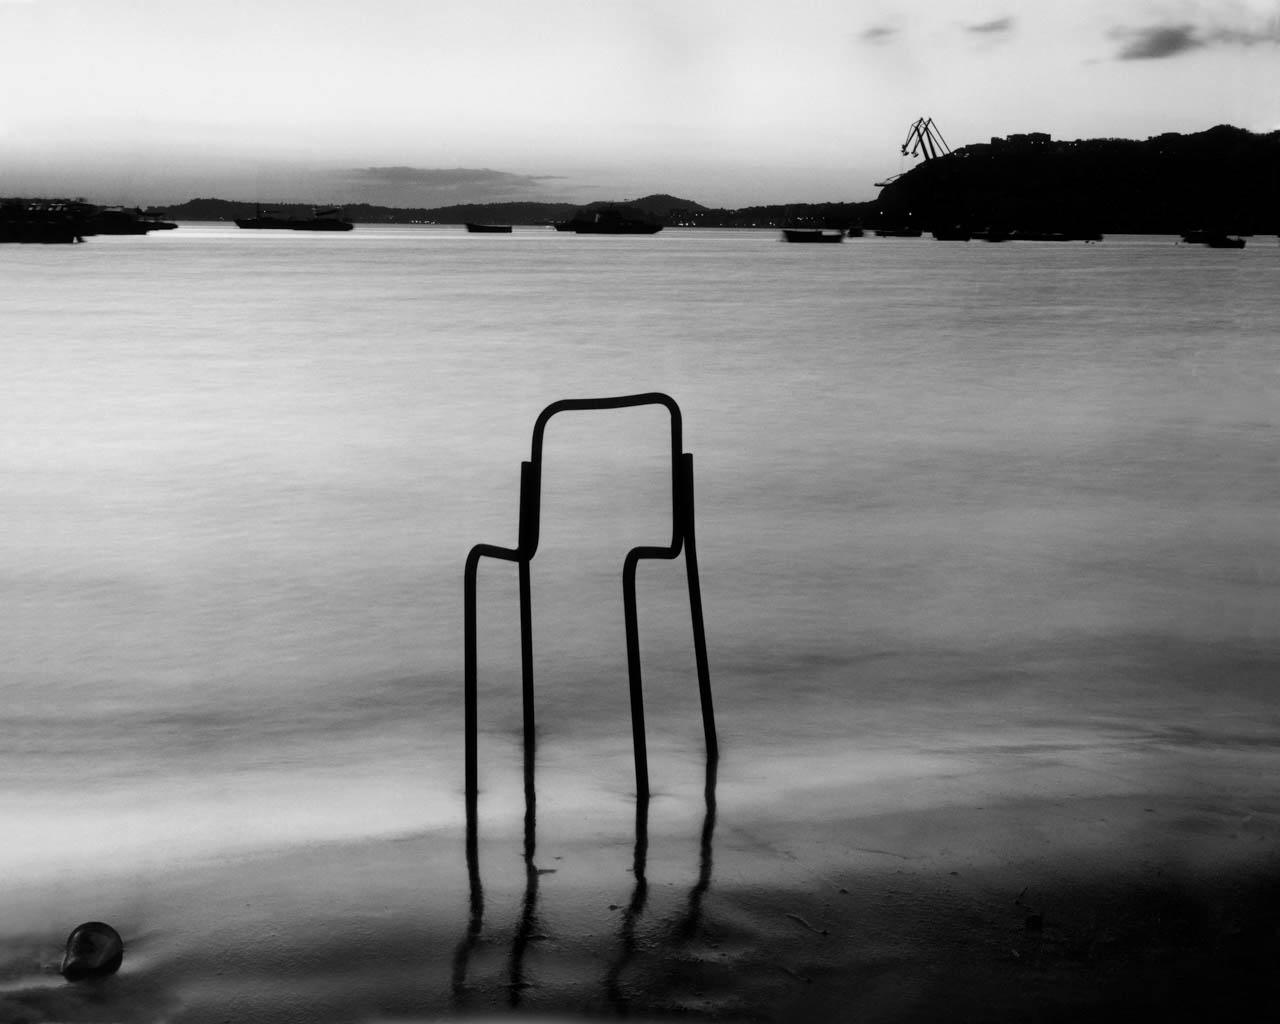 Sedia nell'acqua, Coroglio, 2001 Stampa digitale su carta Hahnemuhle, cm 100x120 / cm 120x140 (ed. 6 + 1AP)